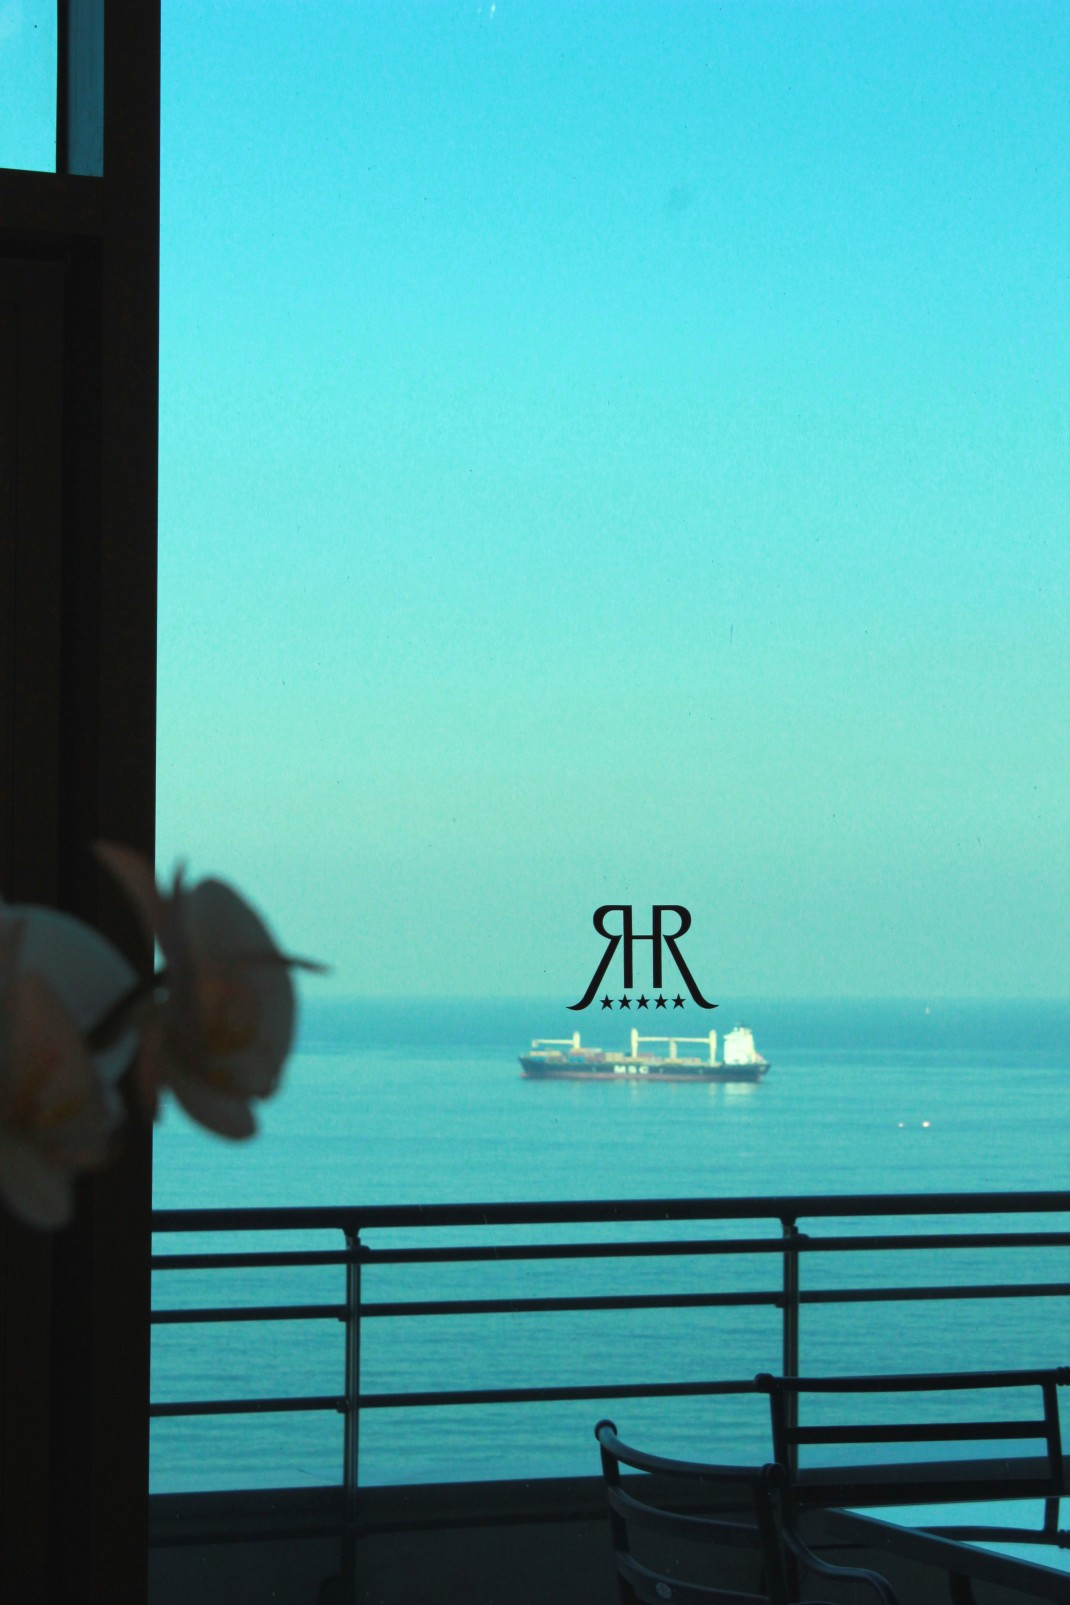 Miniature ship